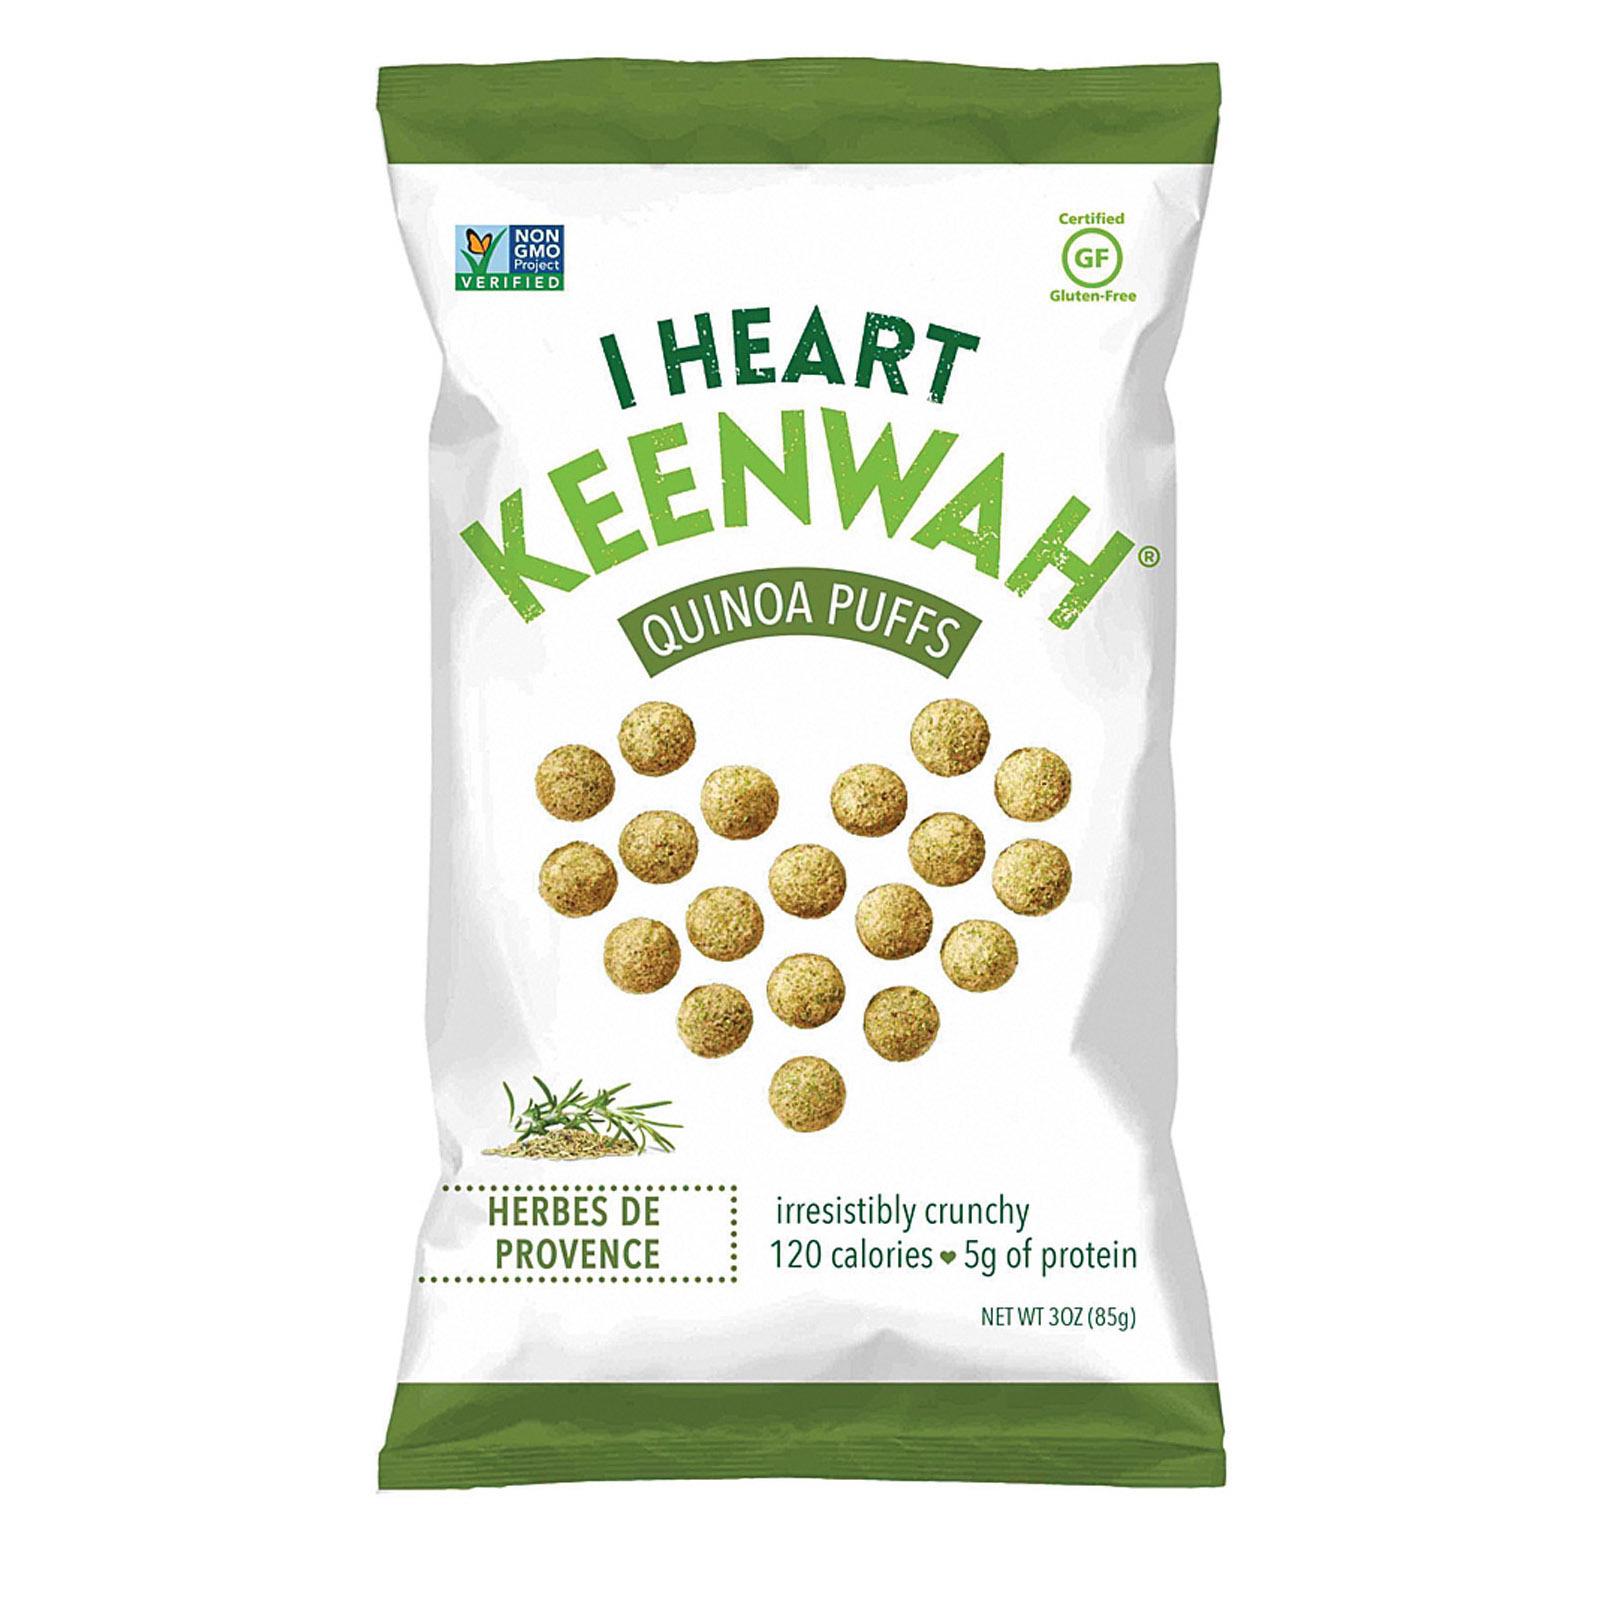 I Heart Keenwah Quinoa Puffs - Herbes De Provence - Case of 12 - 3 oz.